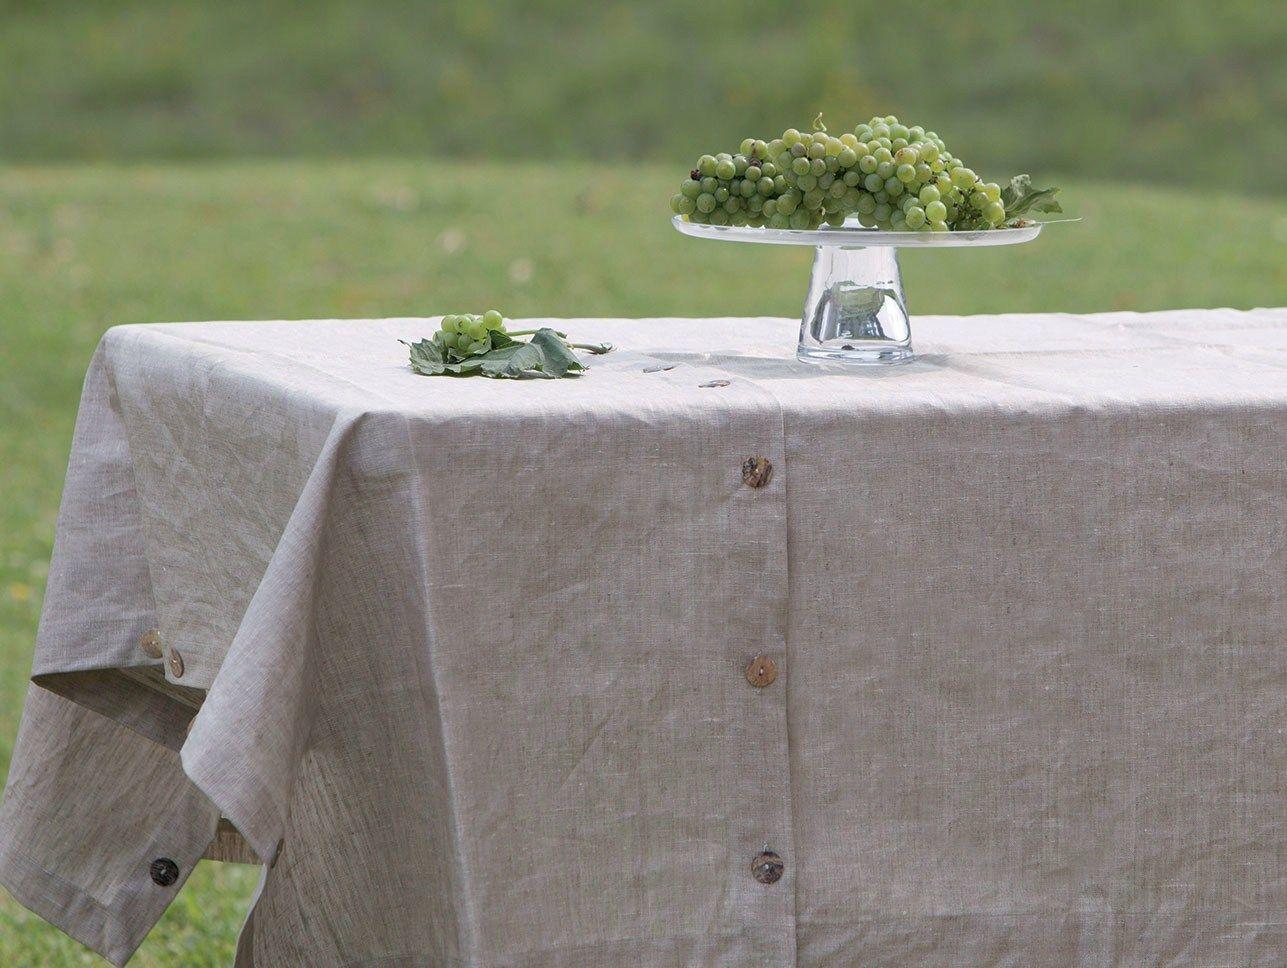 PETALI | Tablecloth By LA FABBRICA DEL LINO